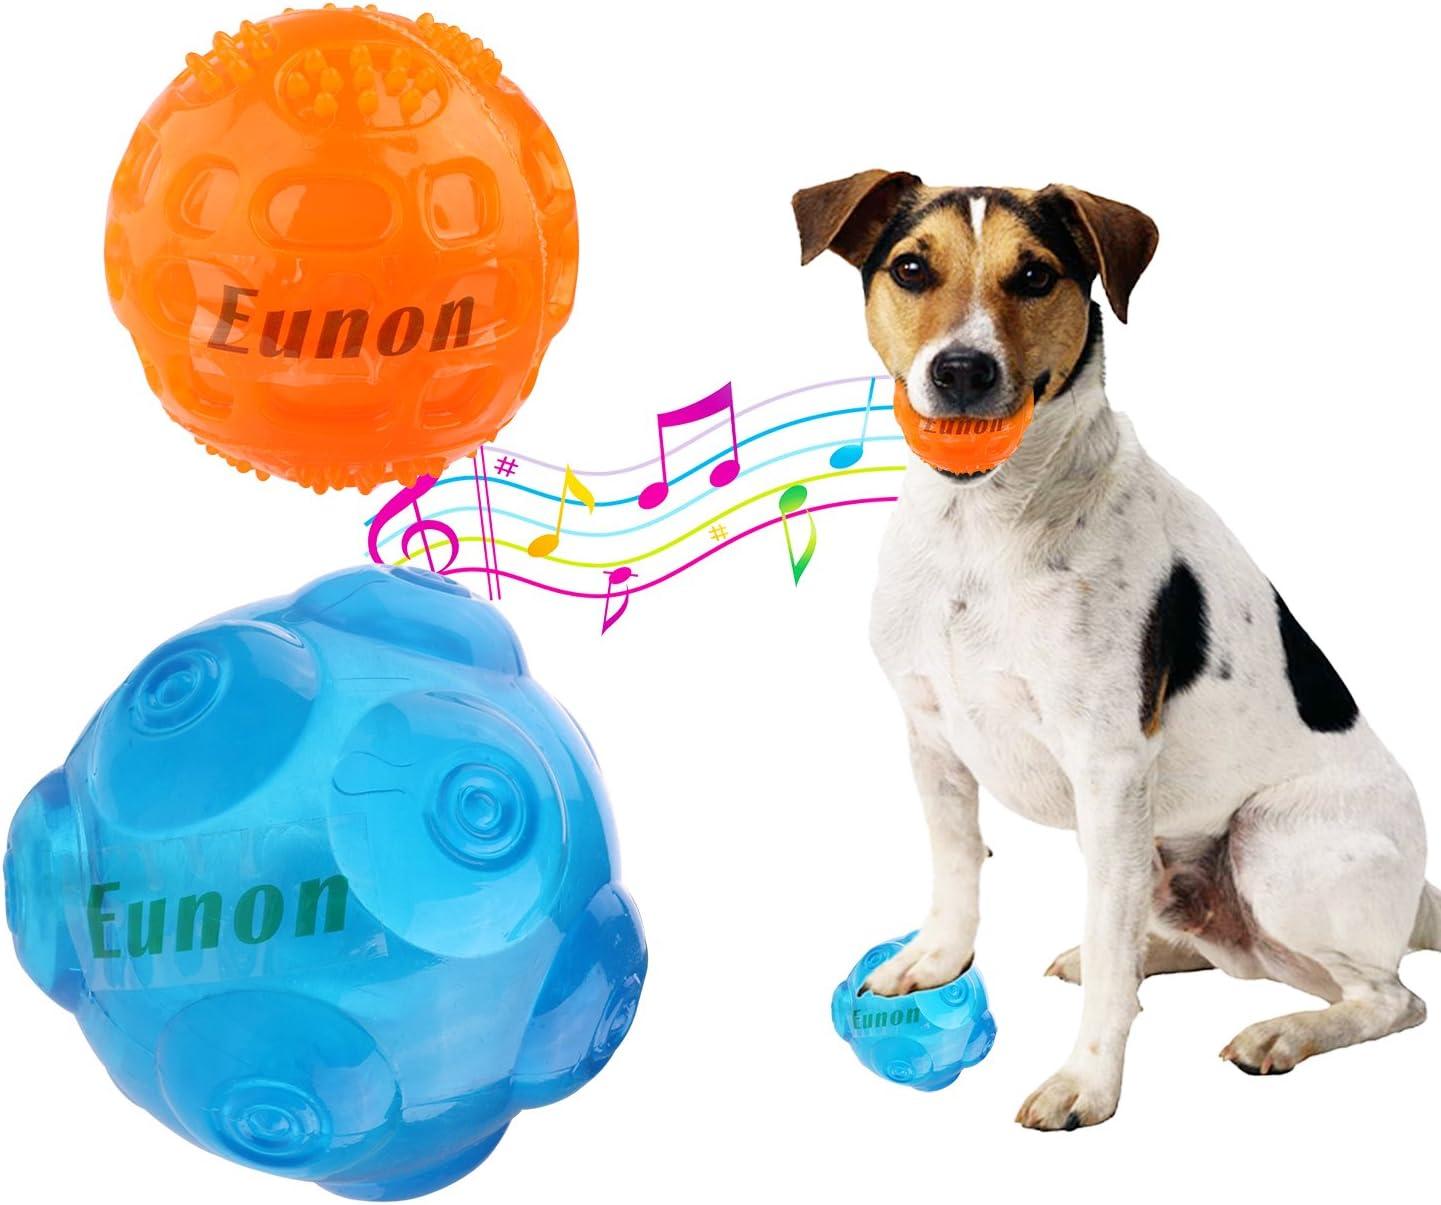 Eunon Pelota de perro de goma, resistente, pelotas indestructibles de goma, pelotas de entrenamiento para mascotas, pack de 2: Amazon.es: Hogar